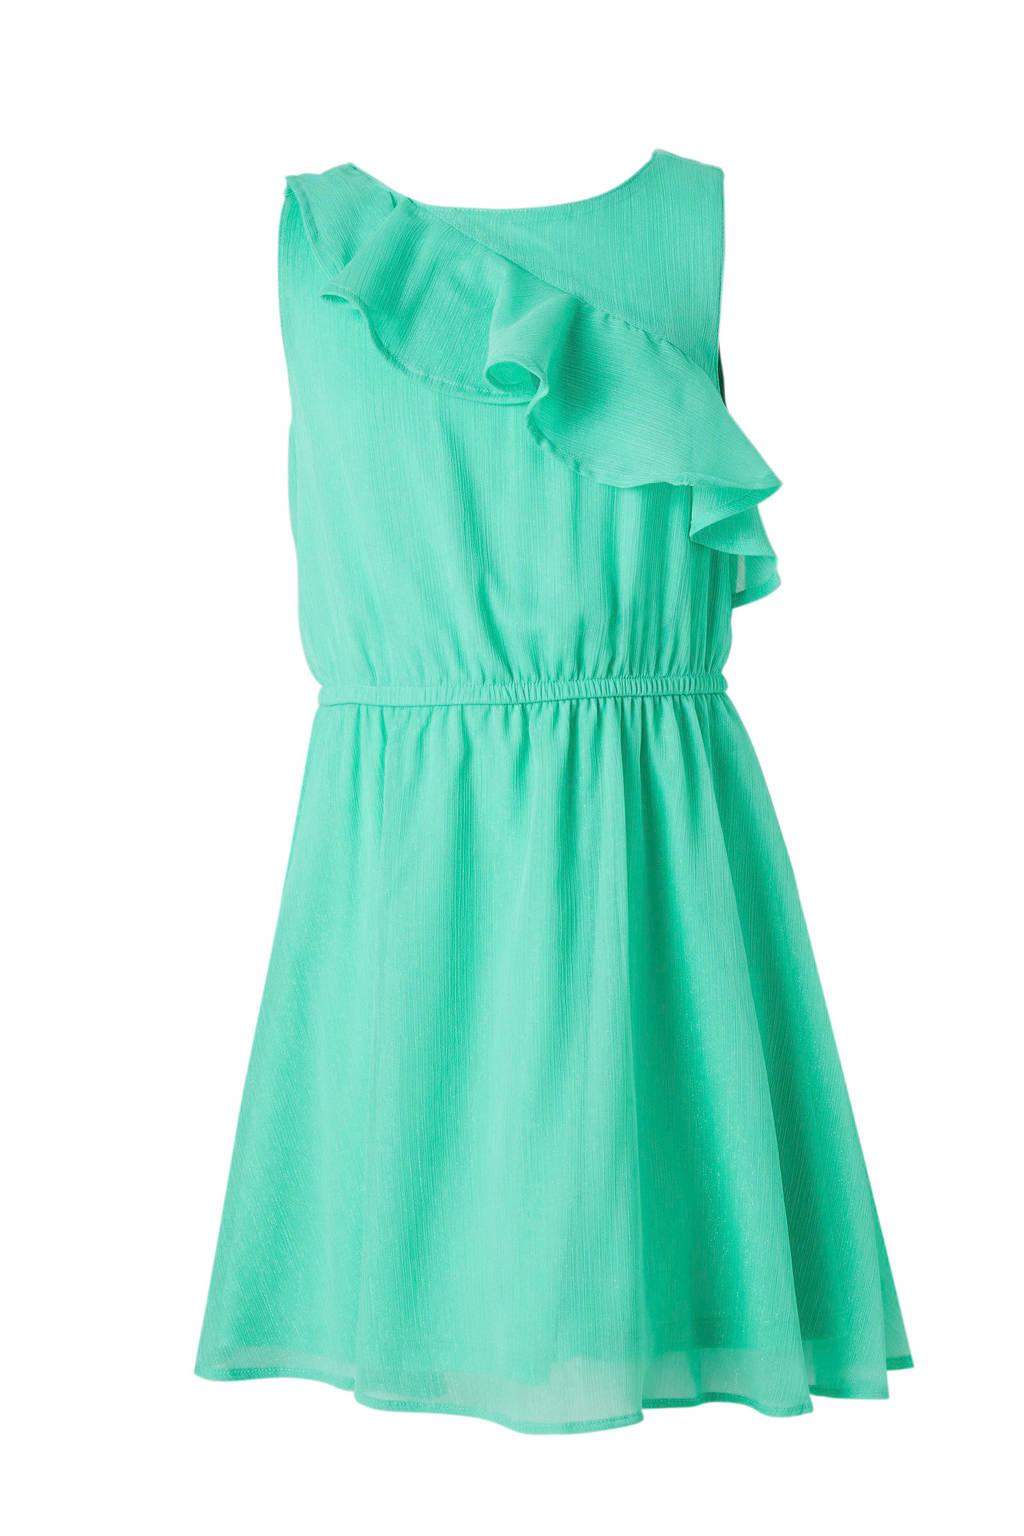 C&A Here & There glitter jurk met volant groen, Groen